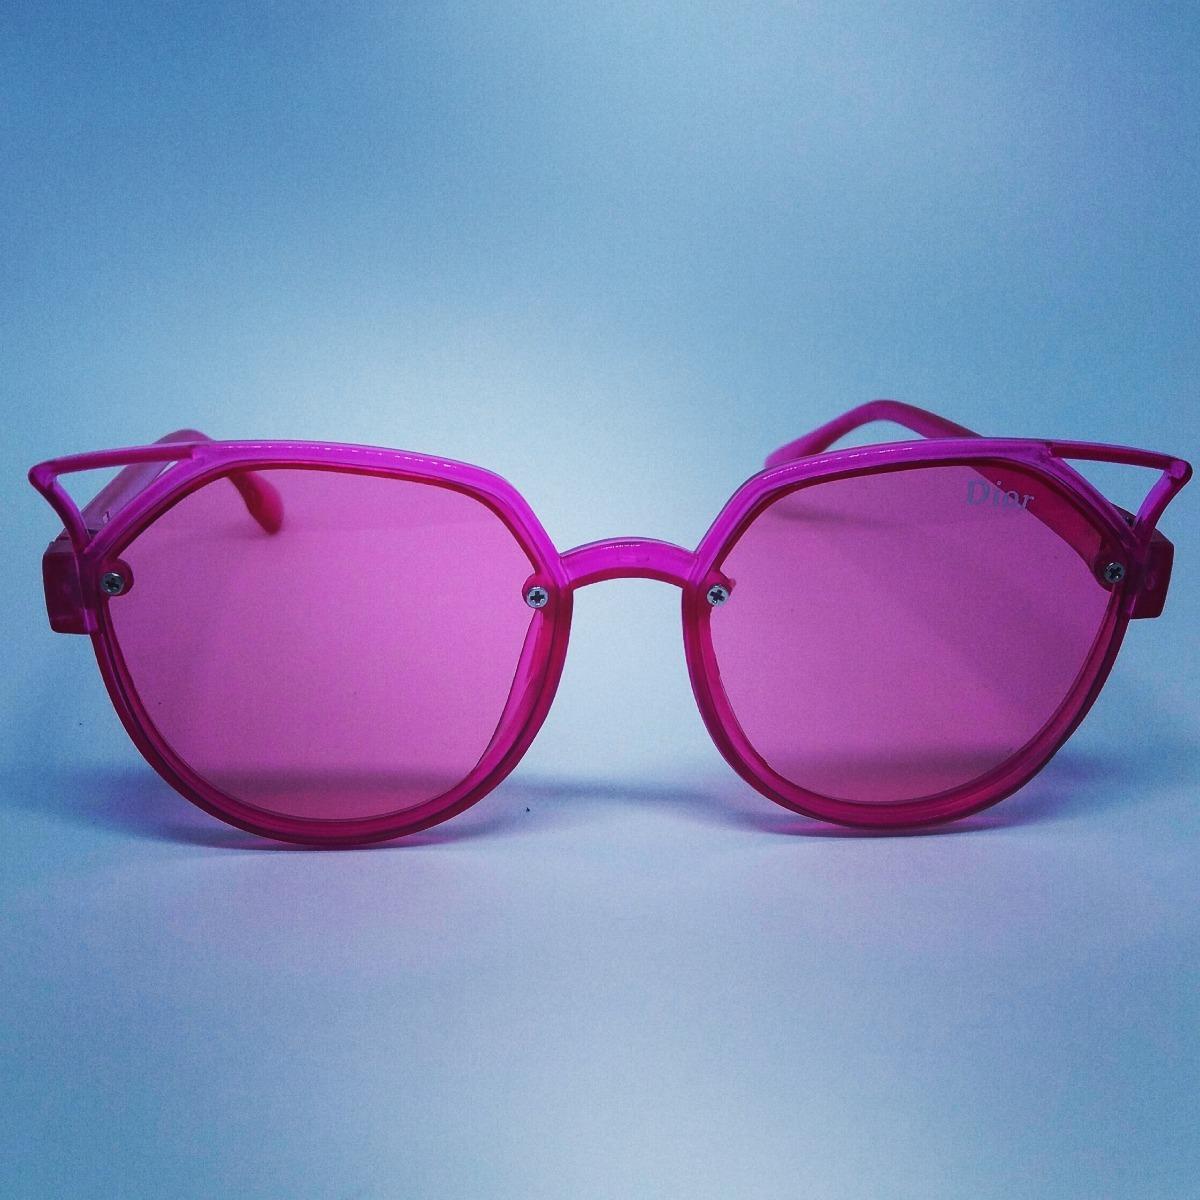 1390f9b12 Óculos De Sol Infantil Feminino Dio Model - R$ 26,90 | MALE OGA